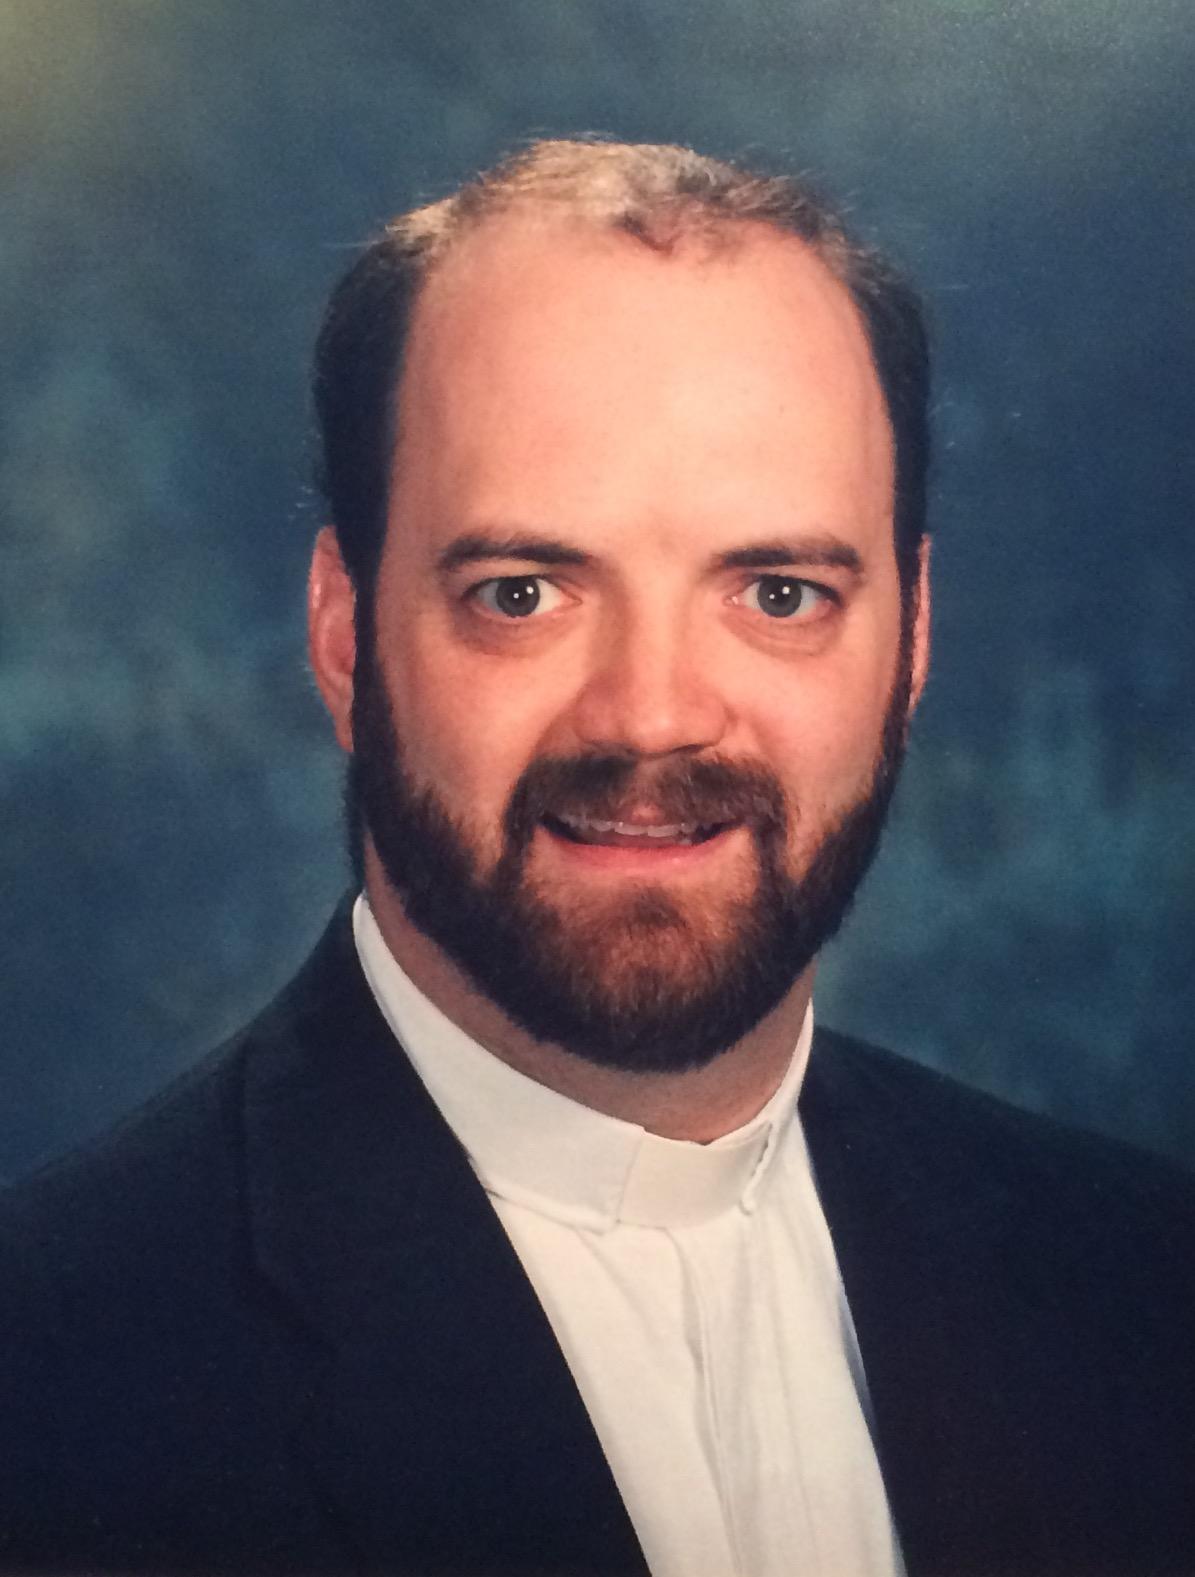 The Rev. Steven P. Edmiston